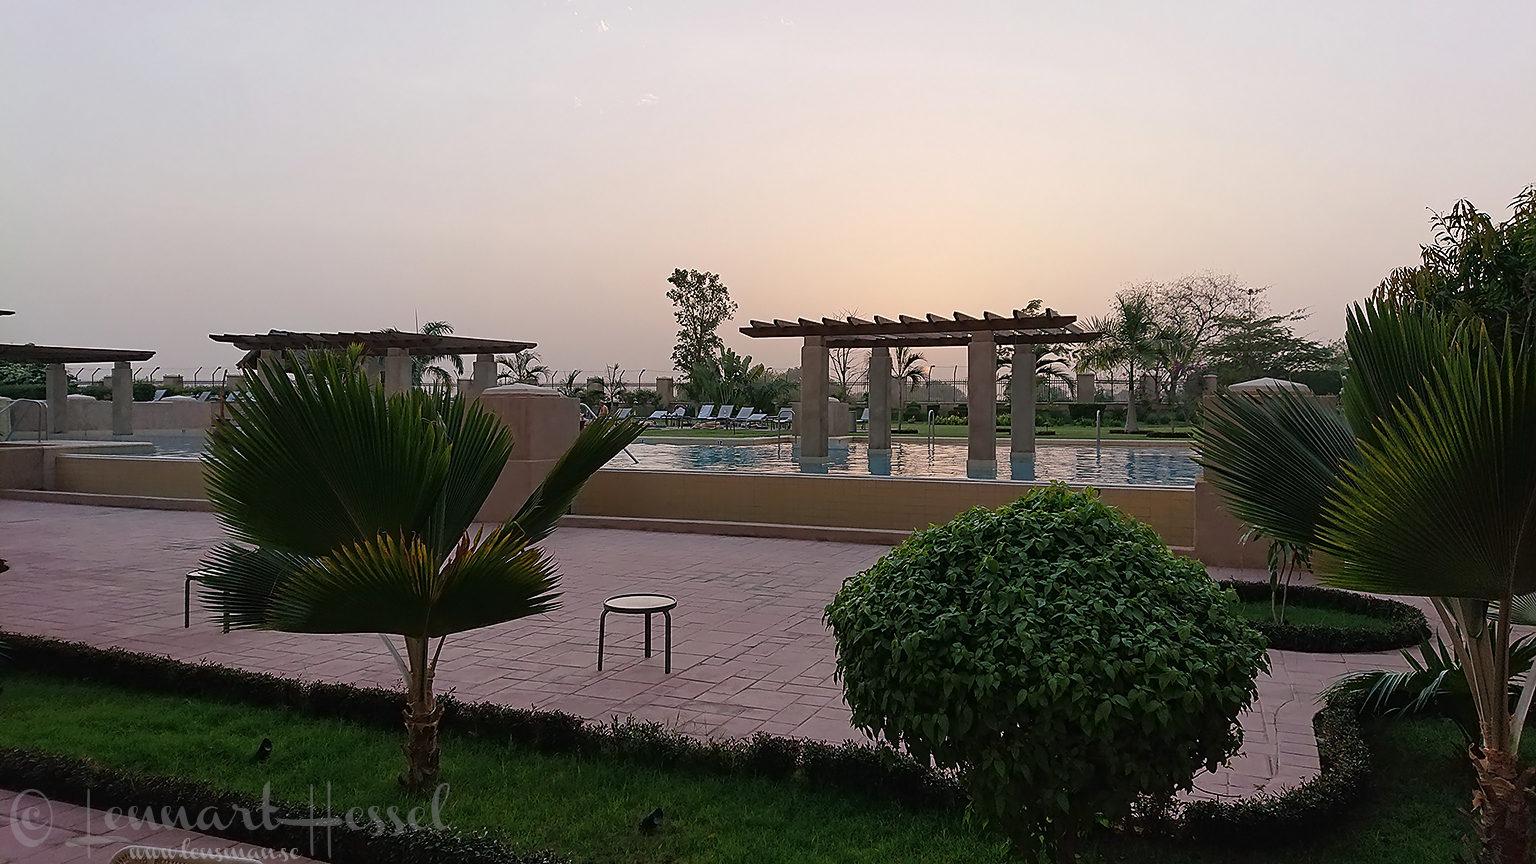 Hilton pool area N'Djamena Chad Zakouma